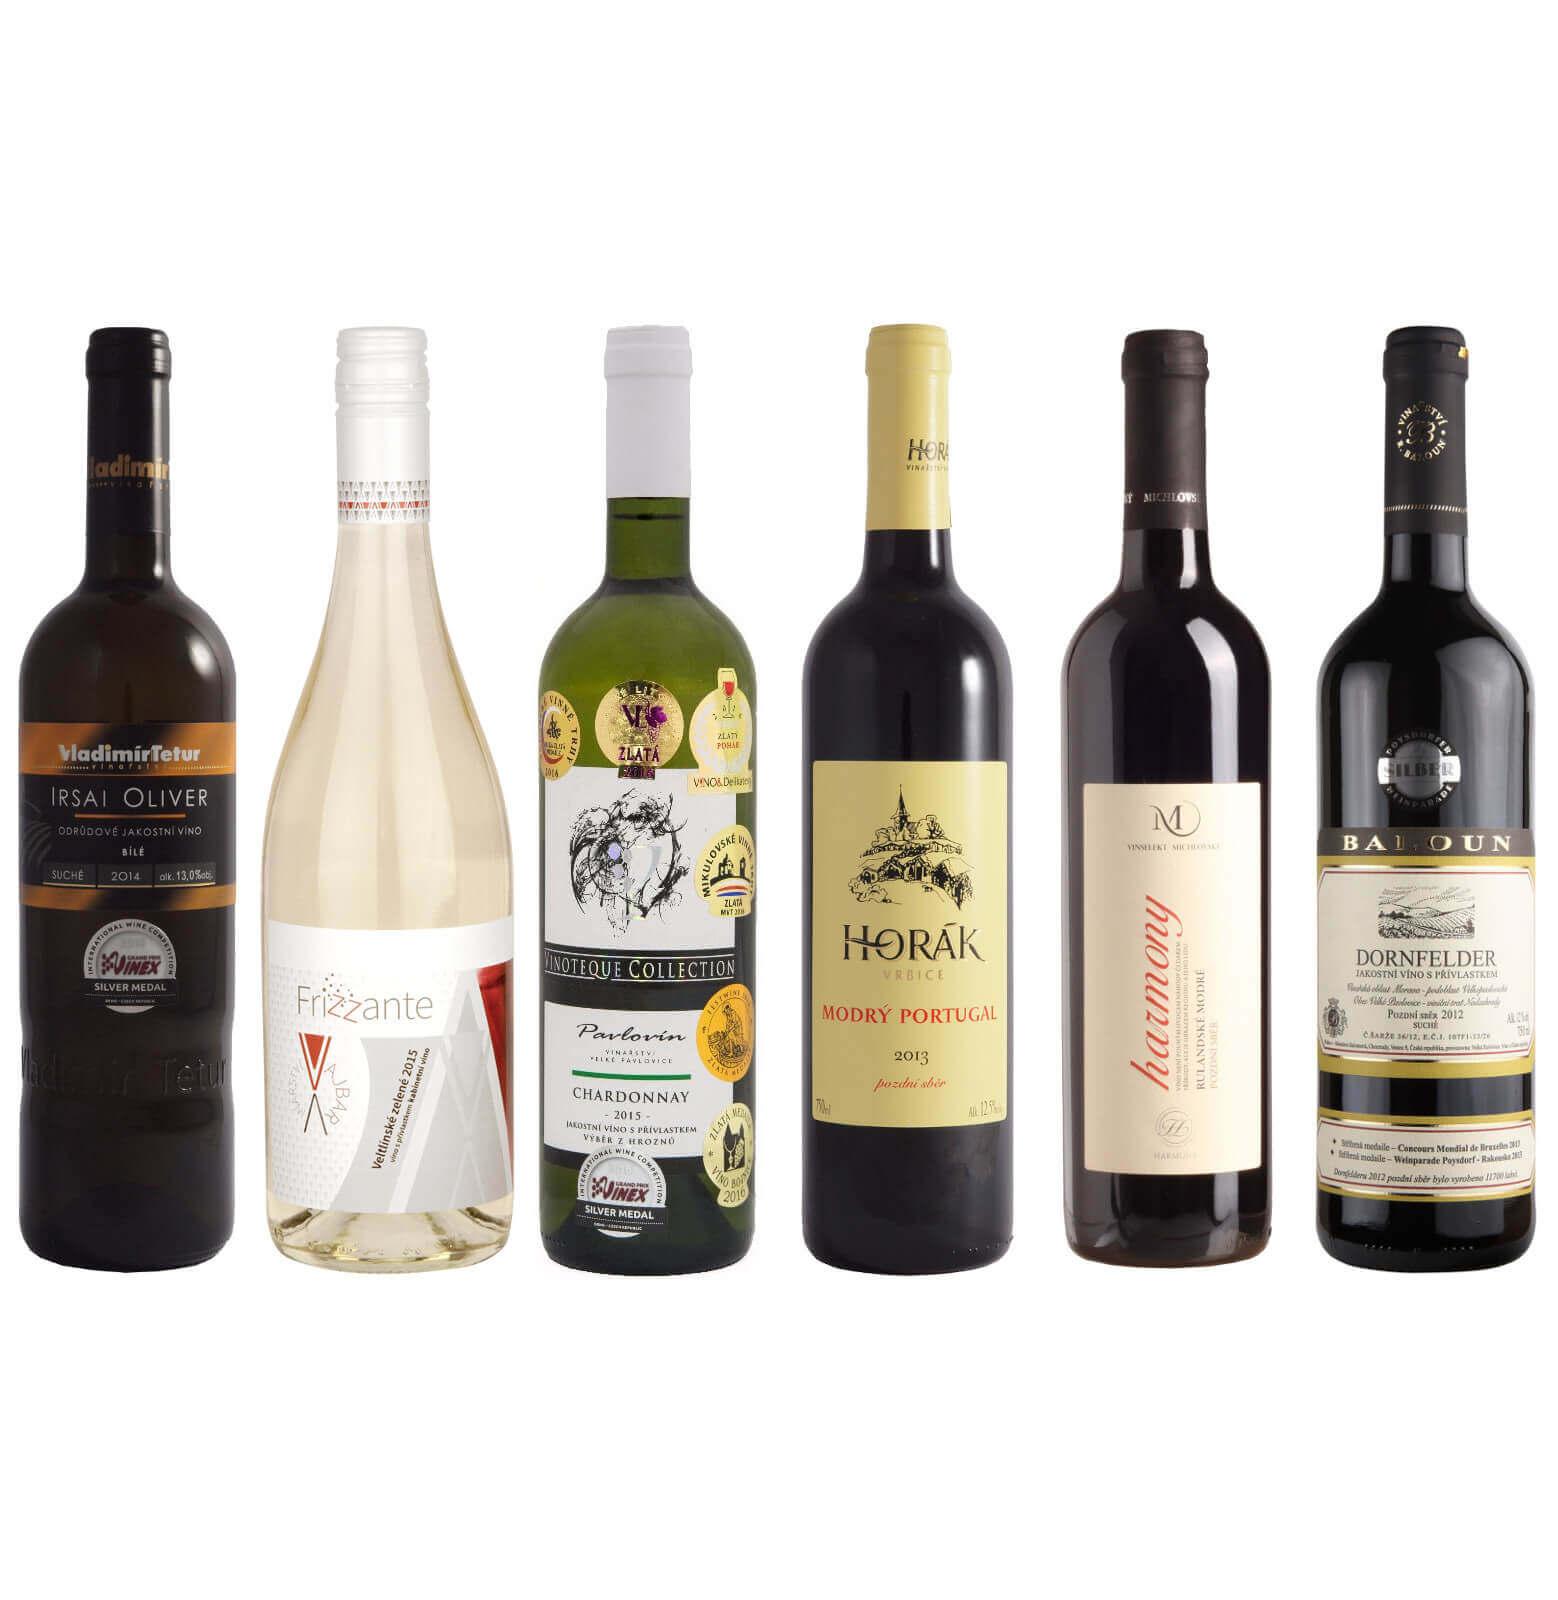 Kolekce z Velkopavlovické vinařské podoblasti